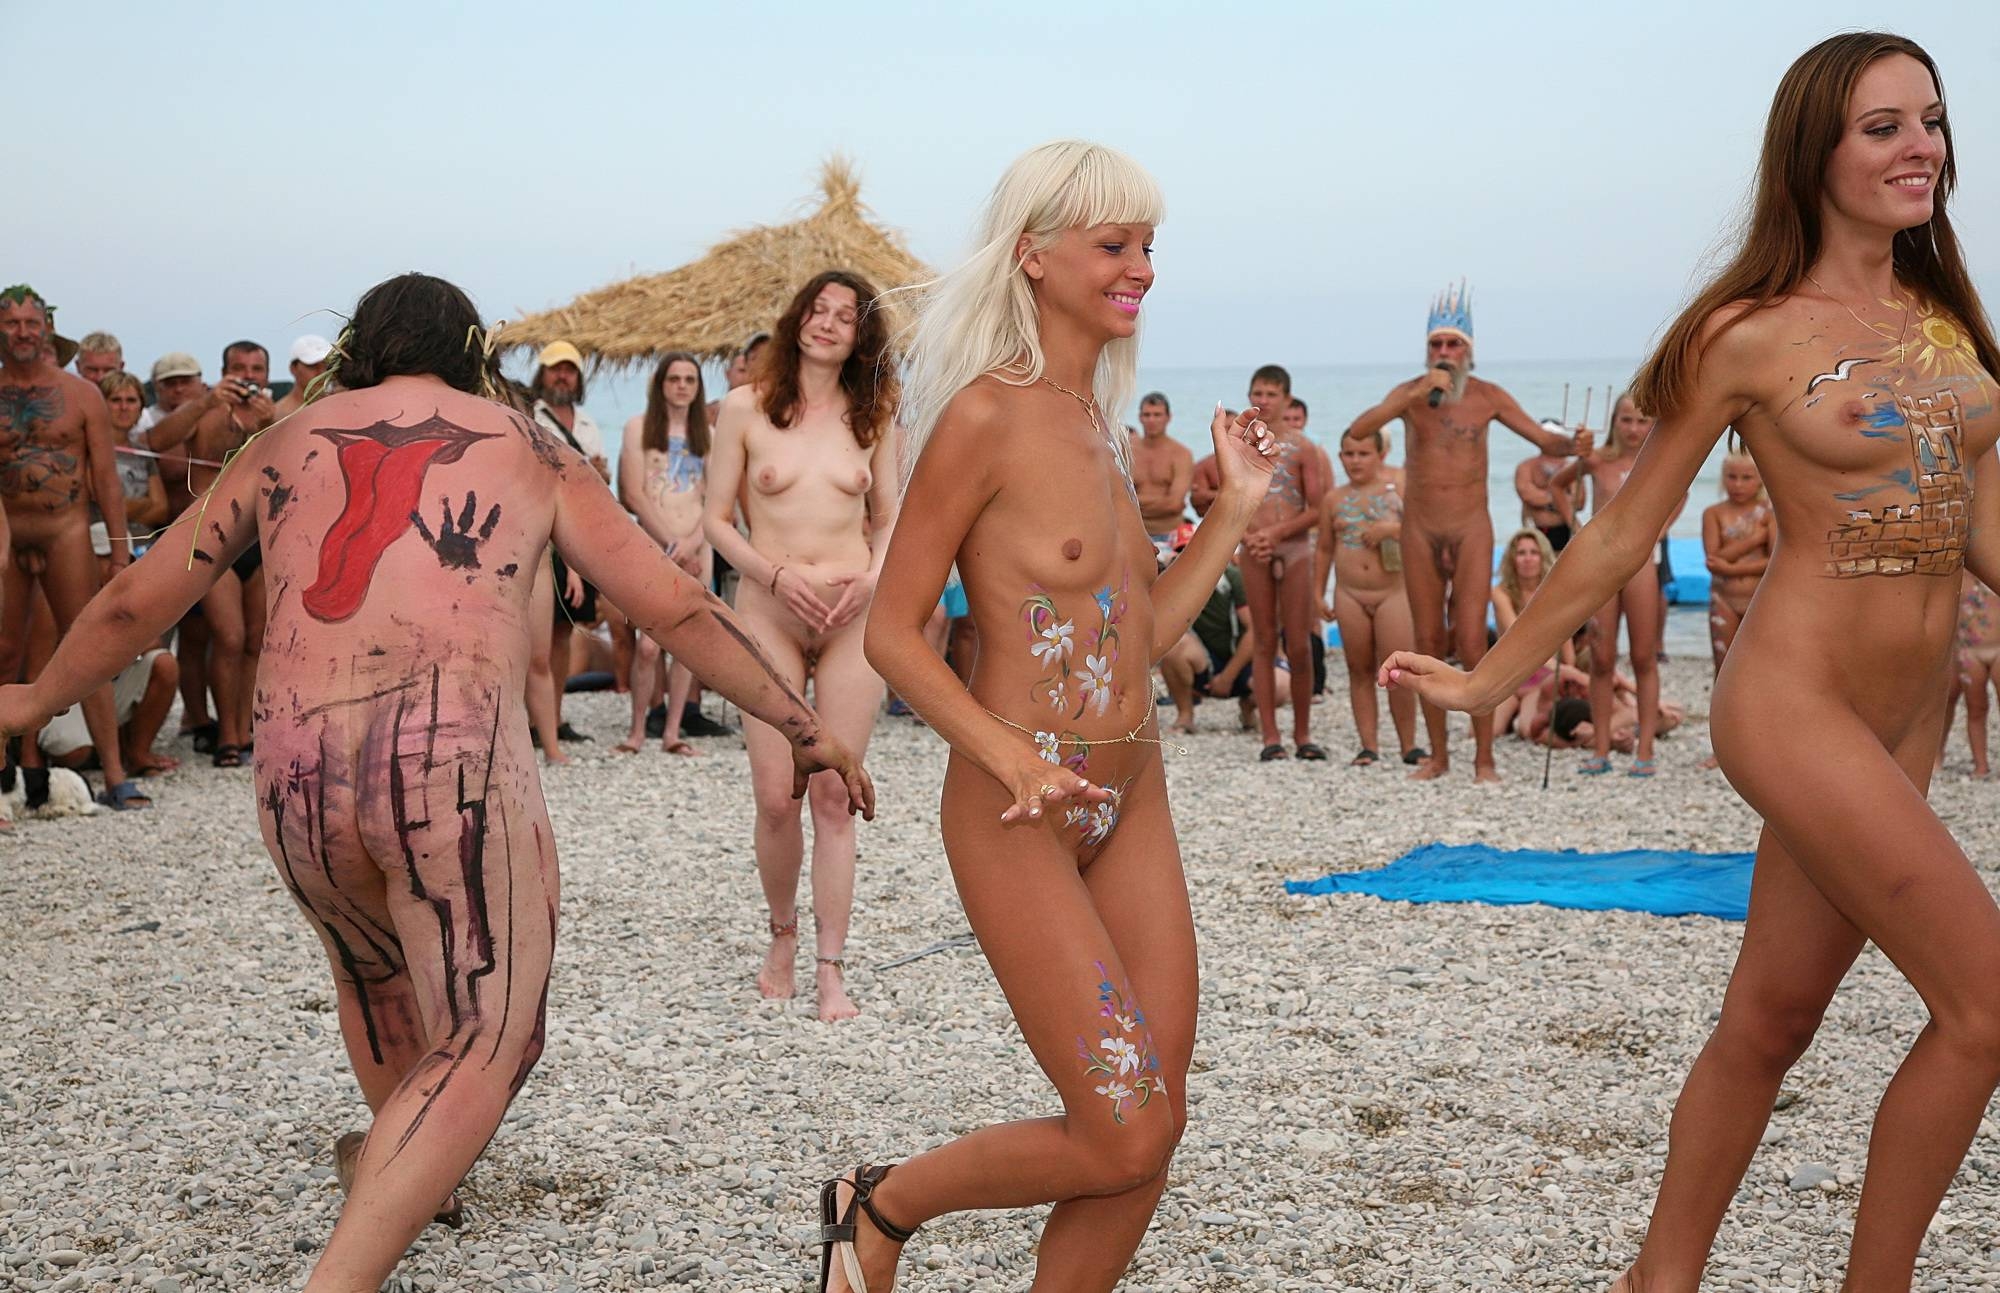 Body Art Demonstration - 1